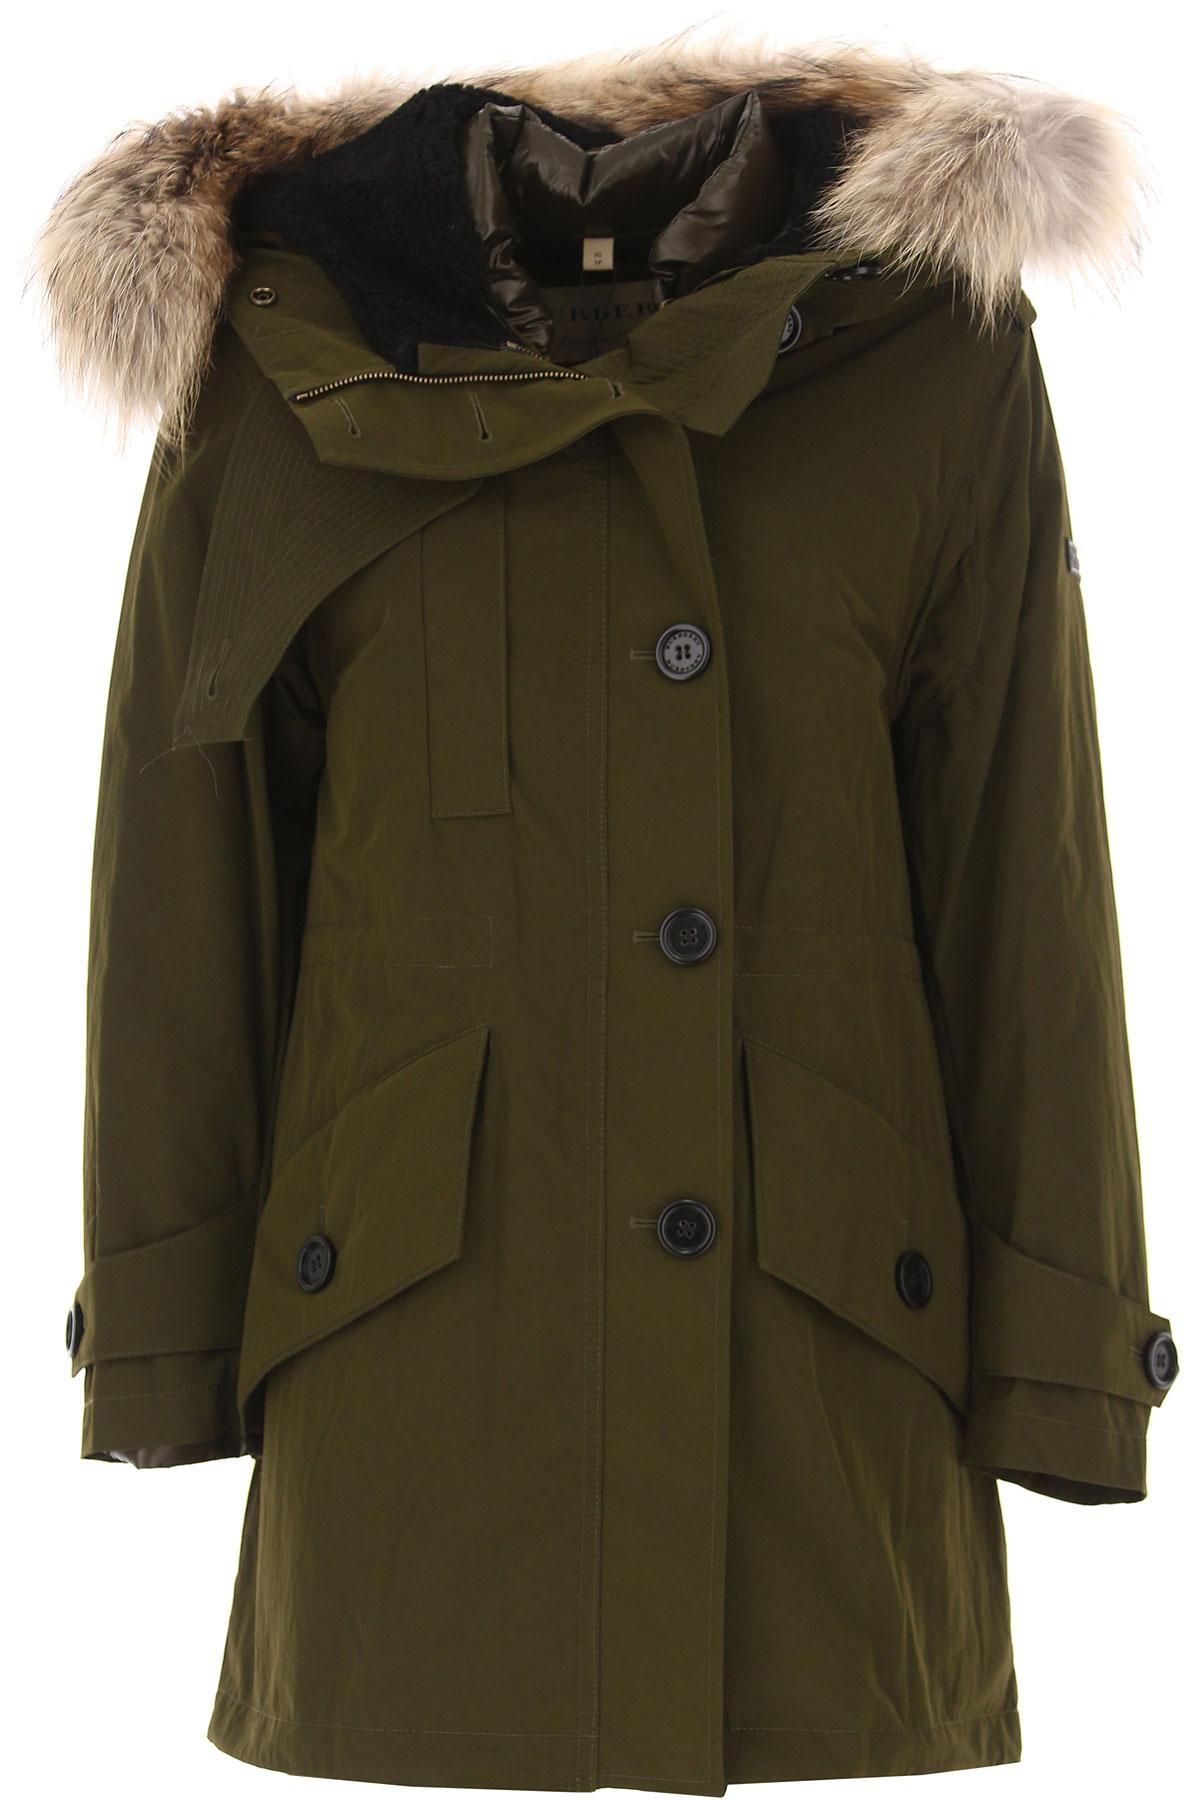 Image of Burberry Down Jacket for Women, Puffer Ski Jacket, Dark Olive Green, polyamide, 2017, 2 4 6 8